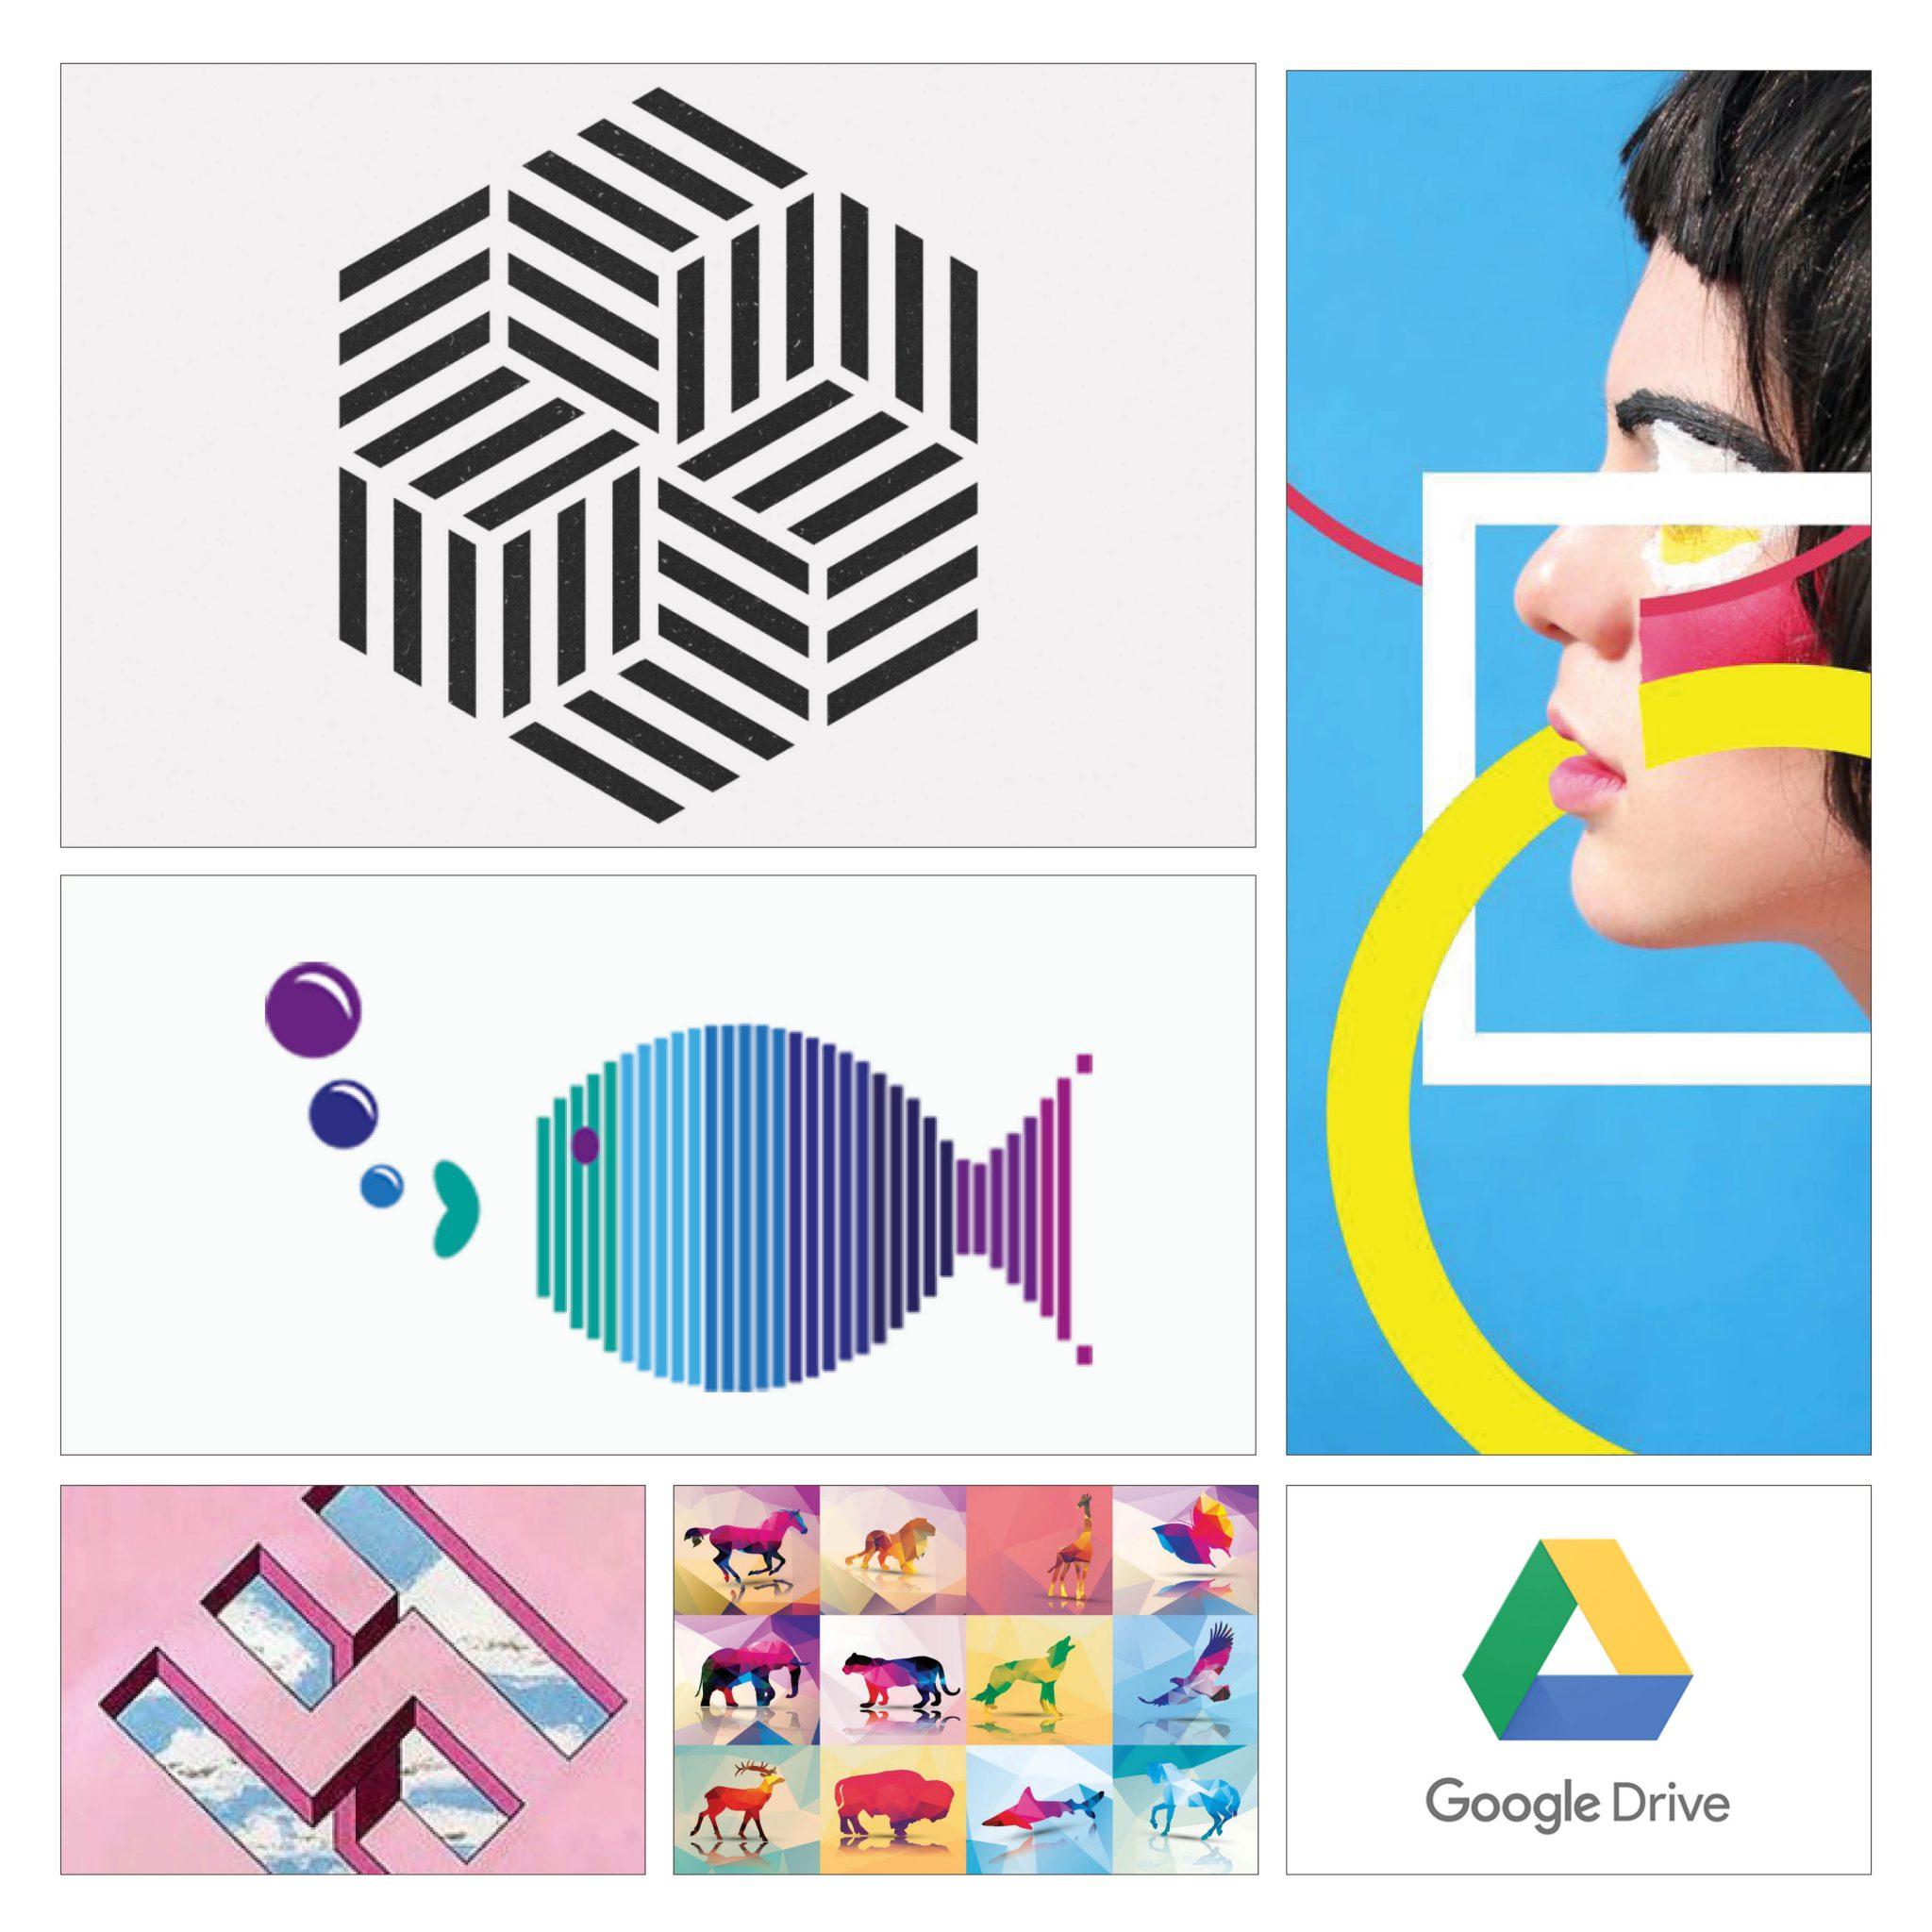 diseño-gráfico-figuras-geométricas